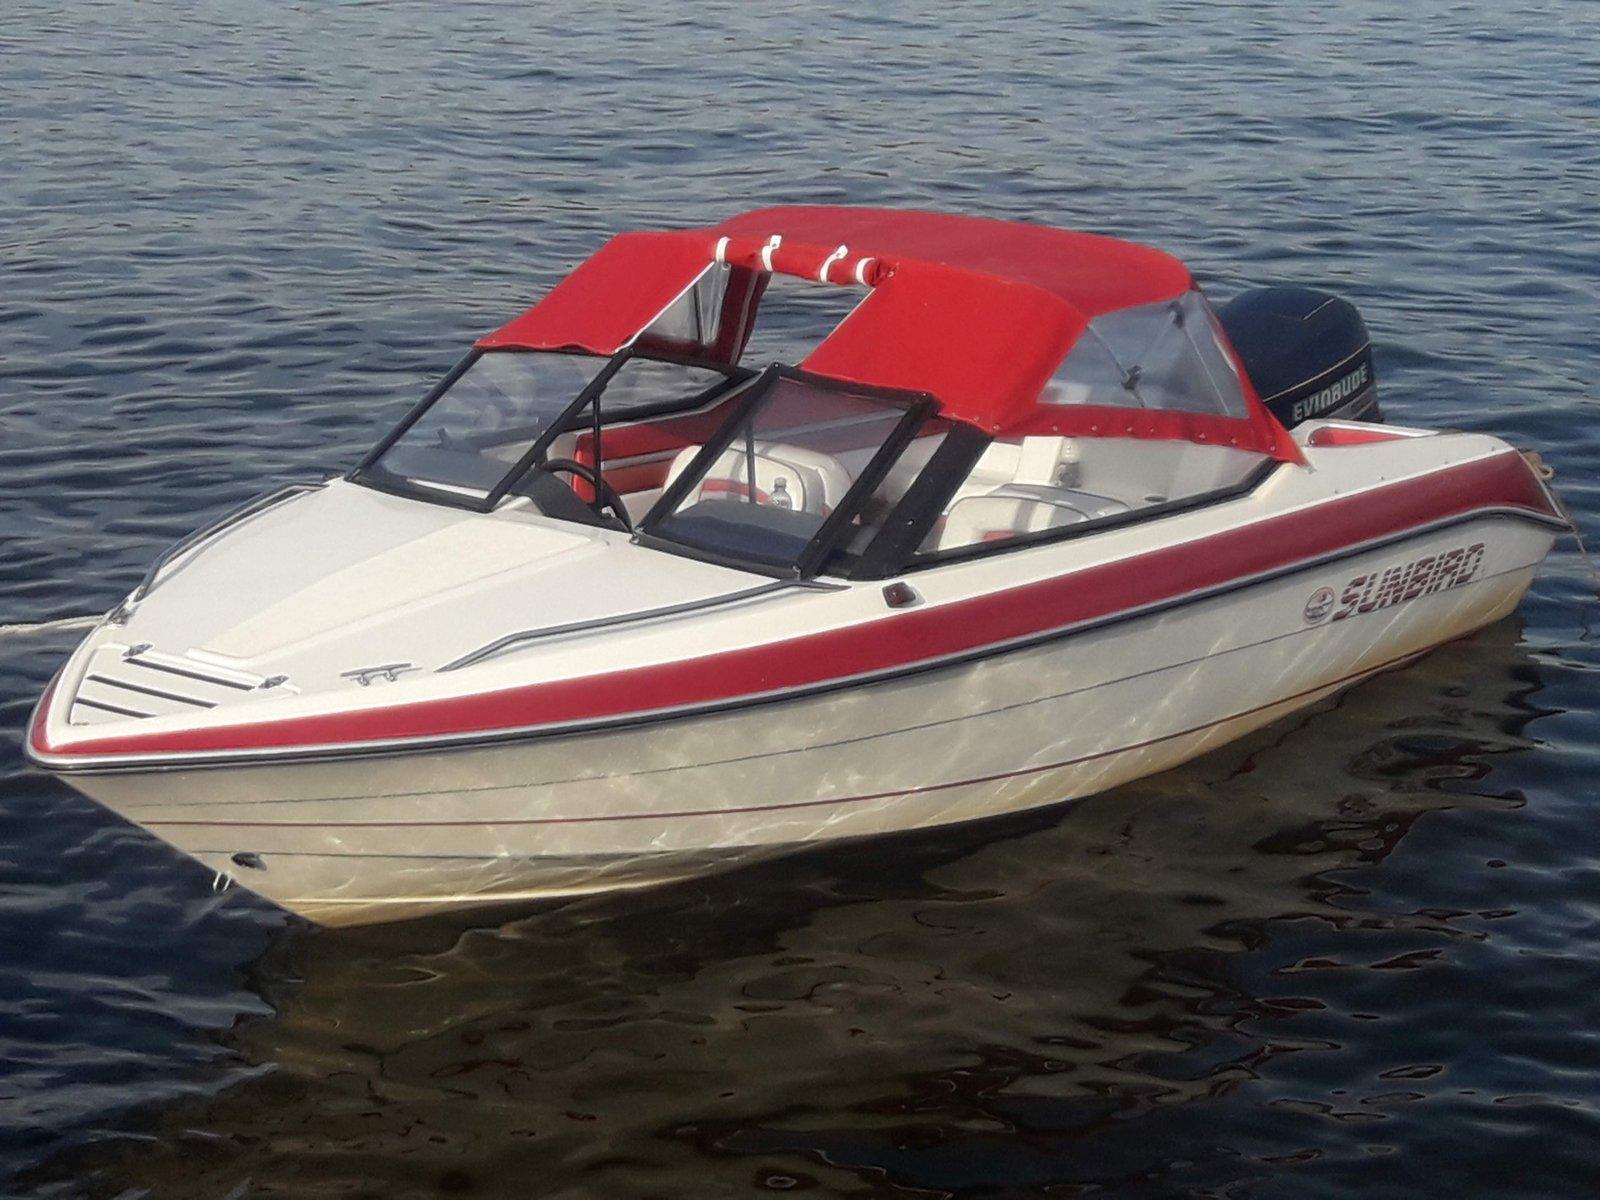 Sunbird corsair 171